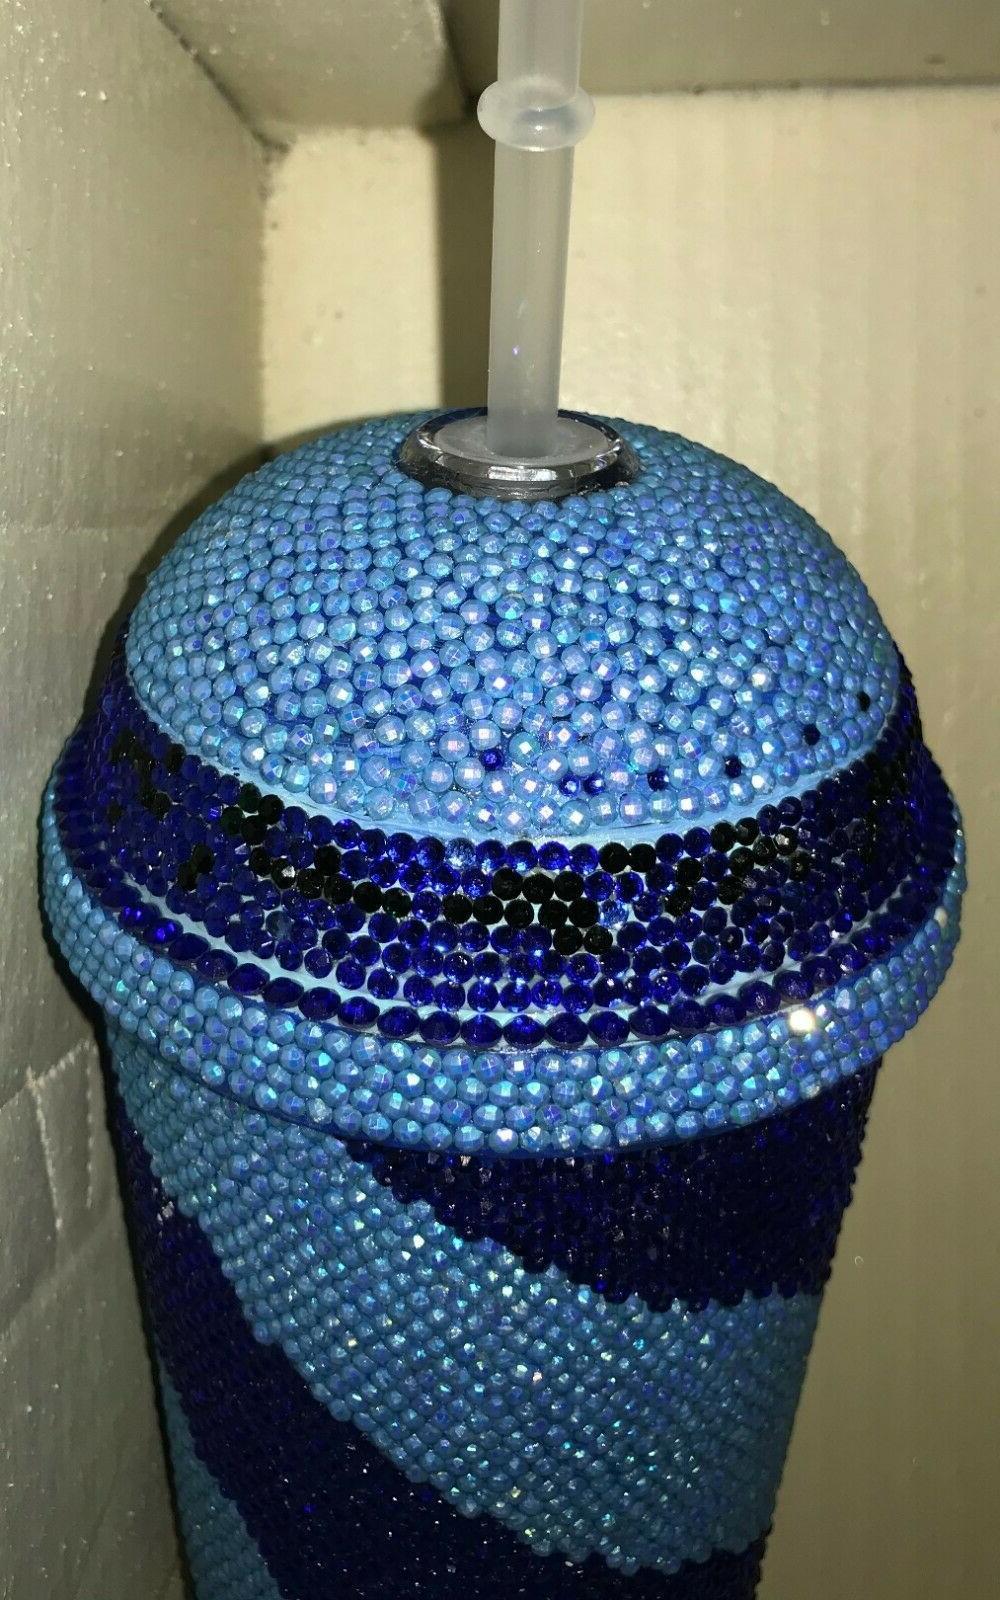 Custom Bling Tumbler Cup oz Swirl Option